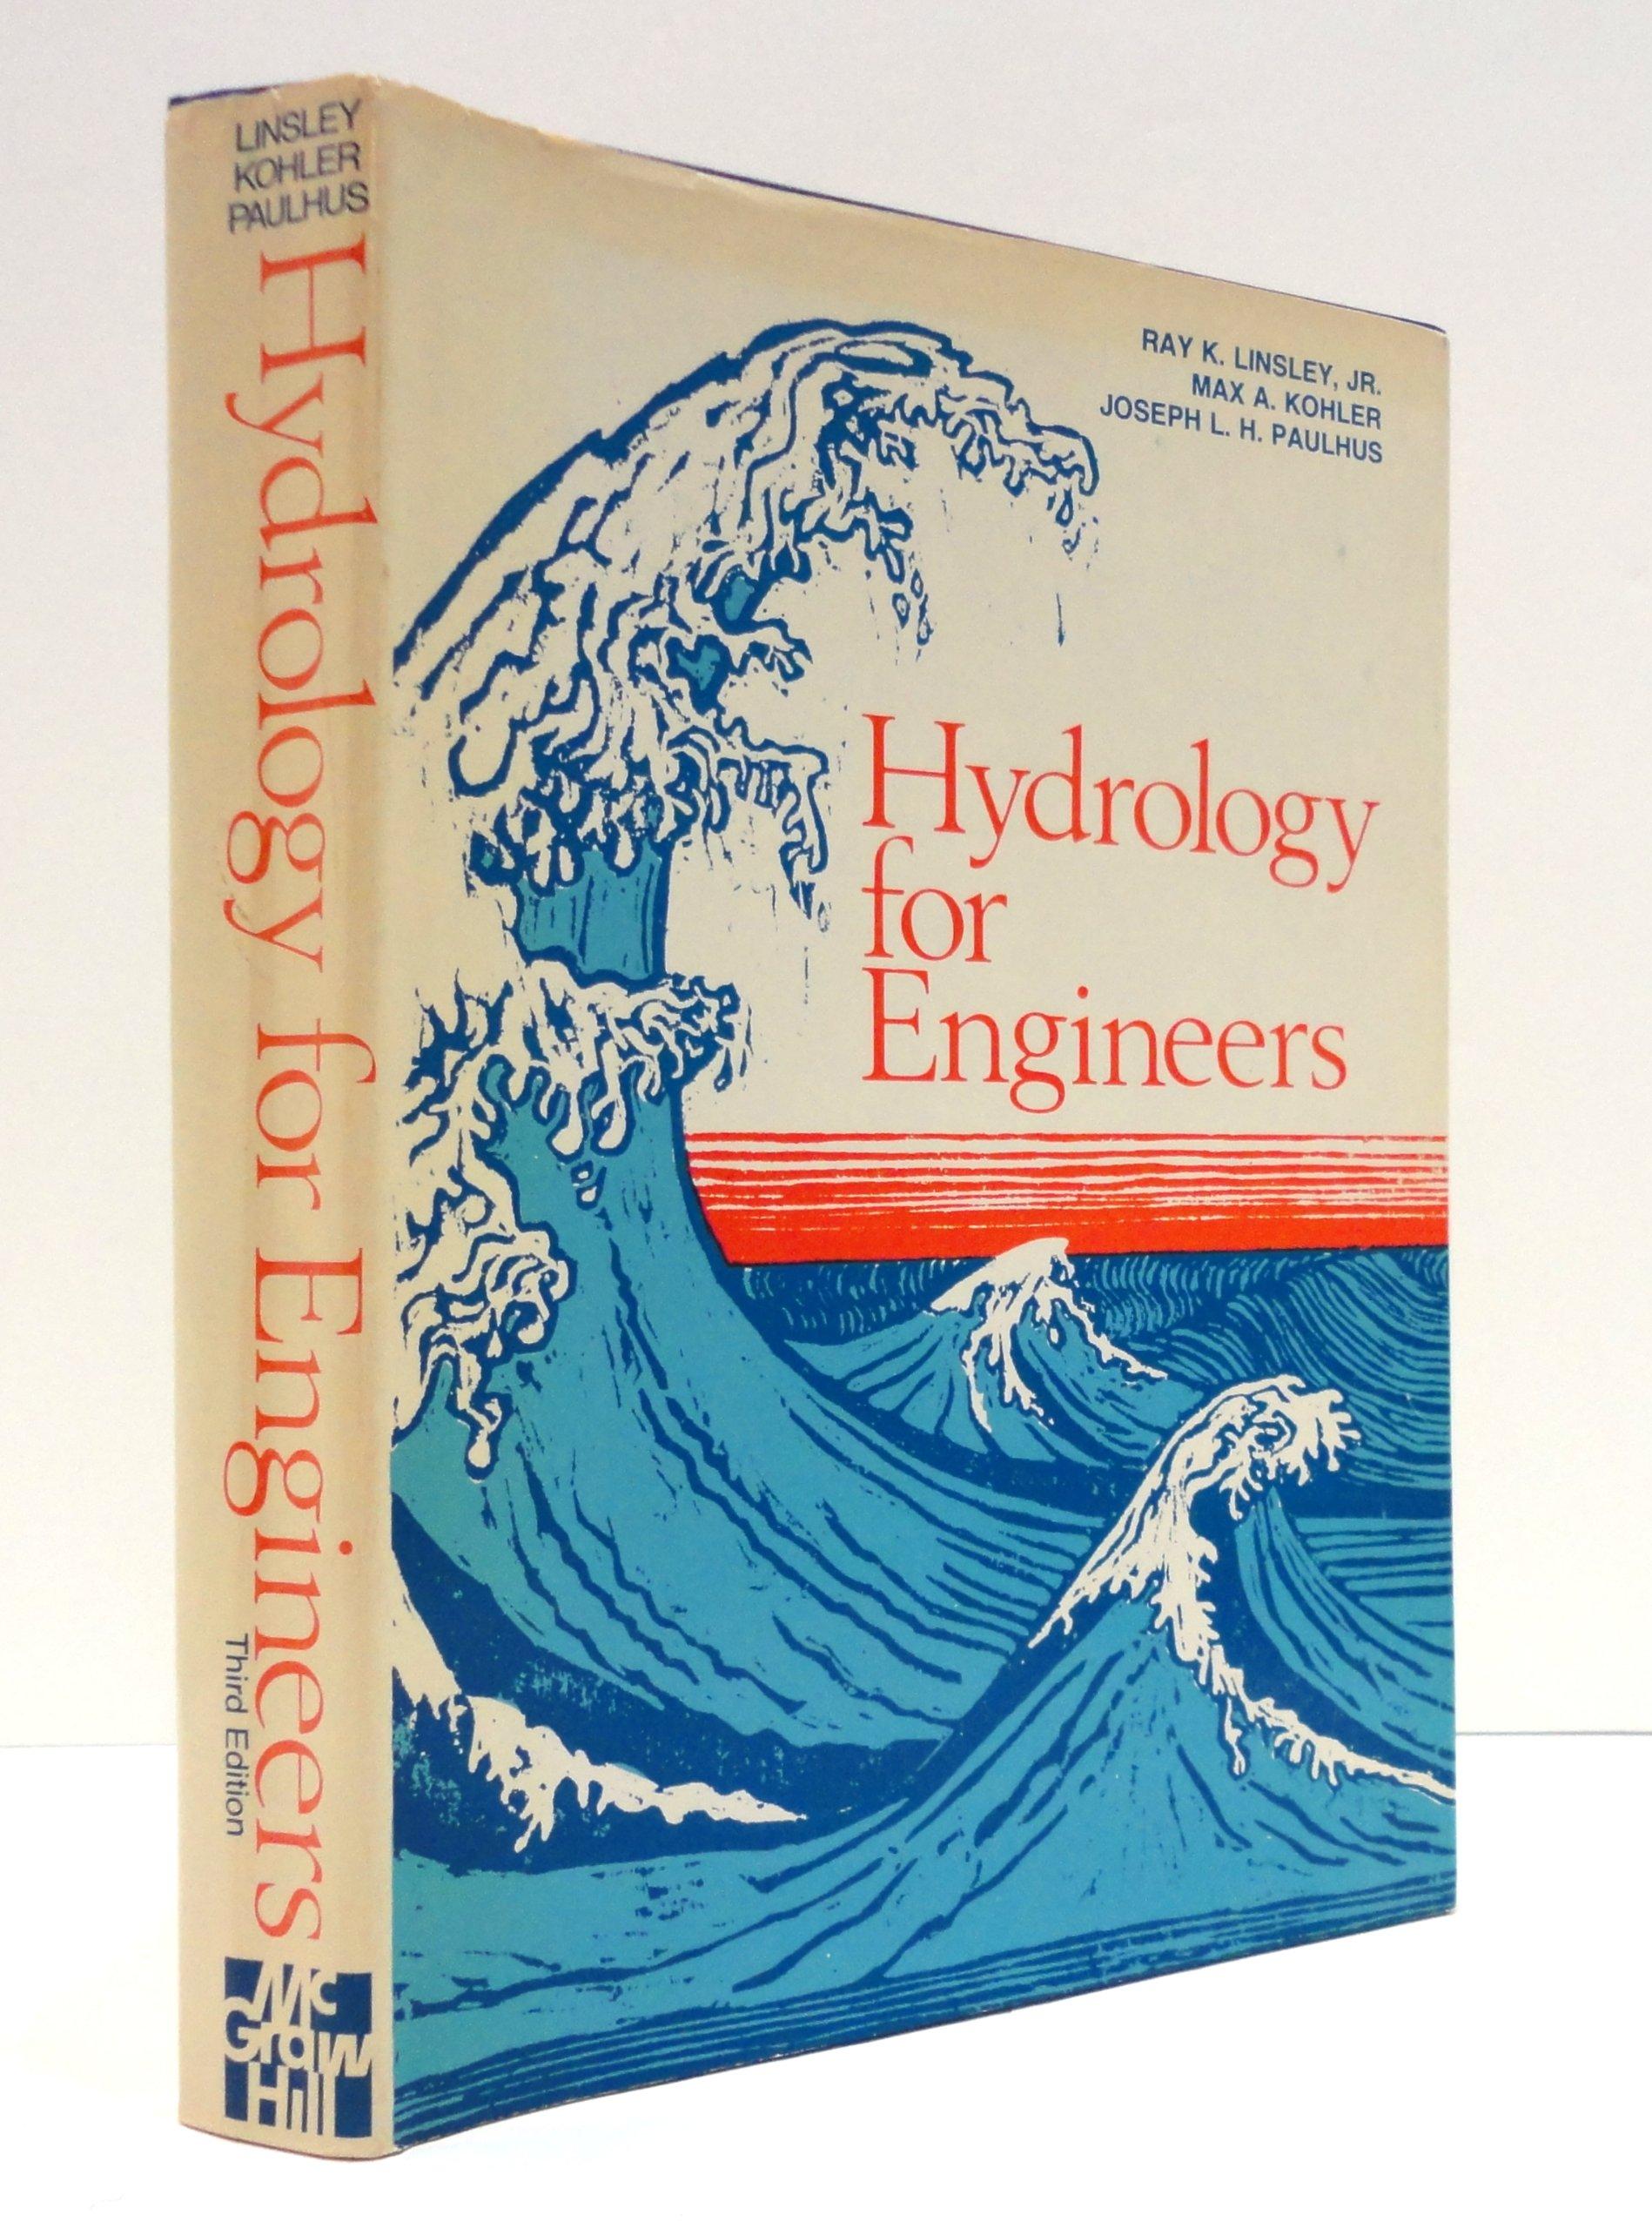 hydrological engineers